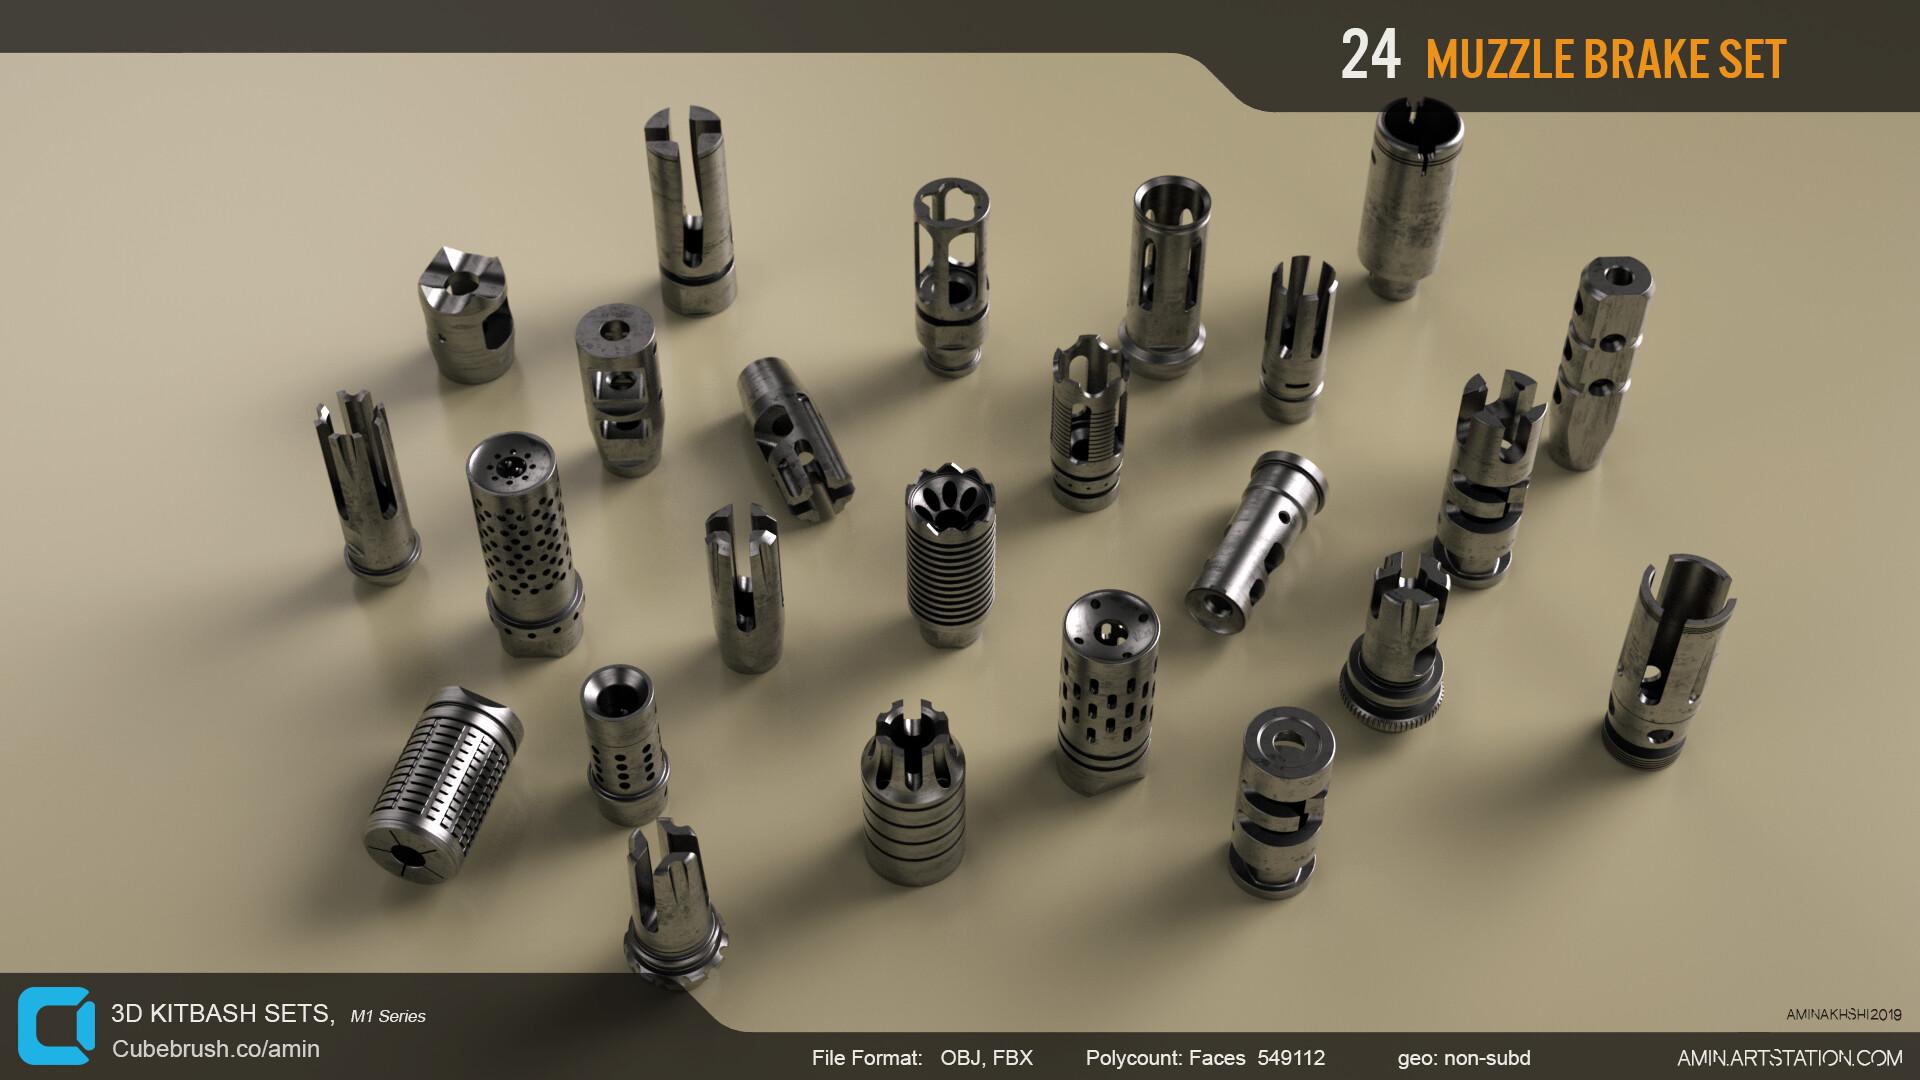 Amin akhshi 004 muzzle brakes set